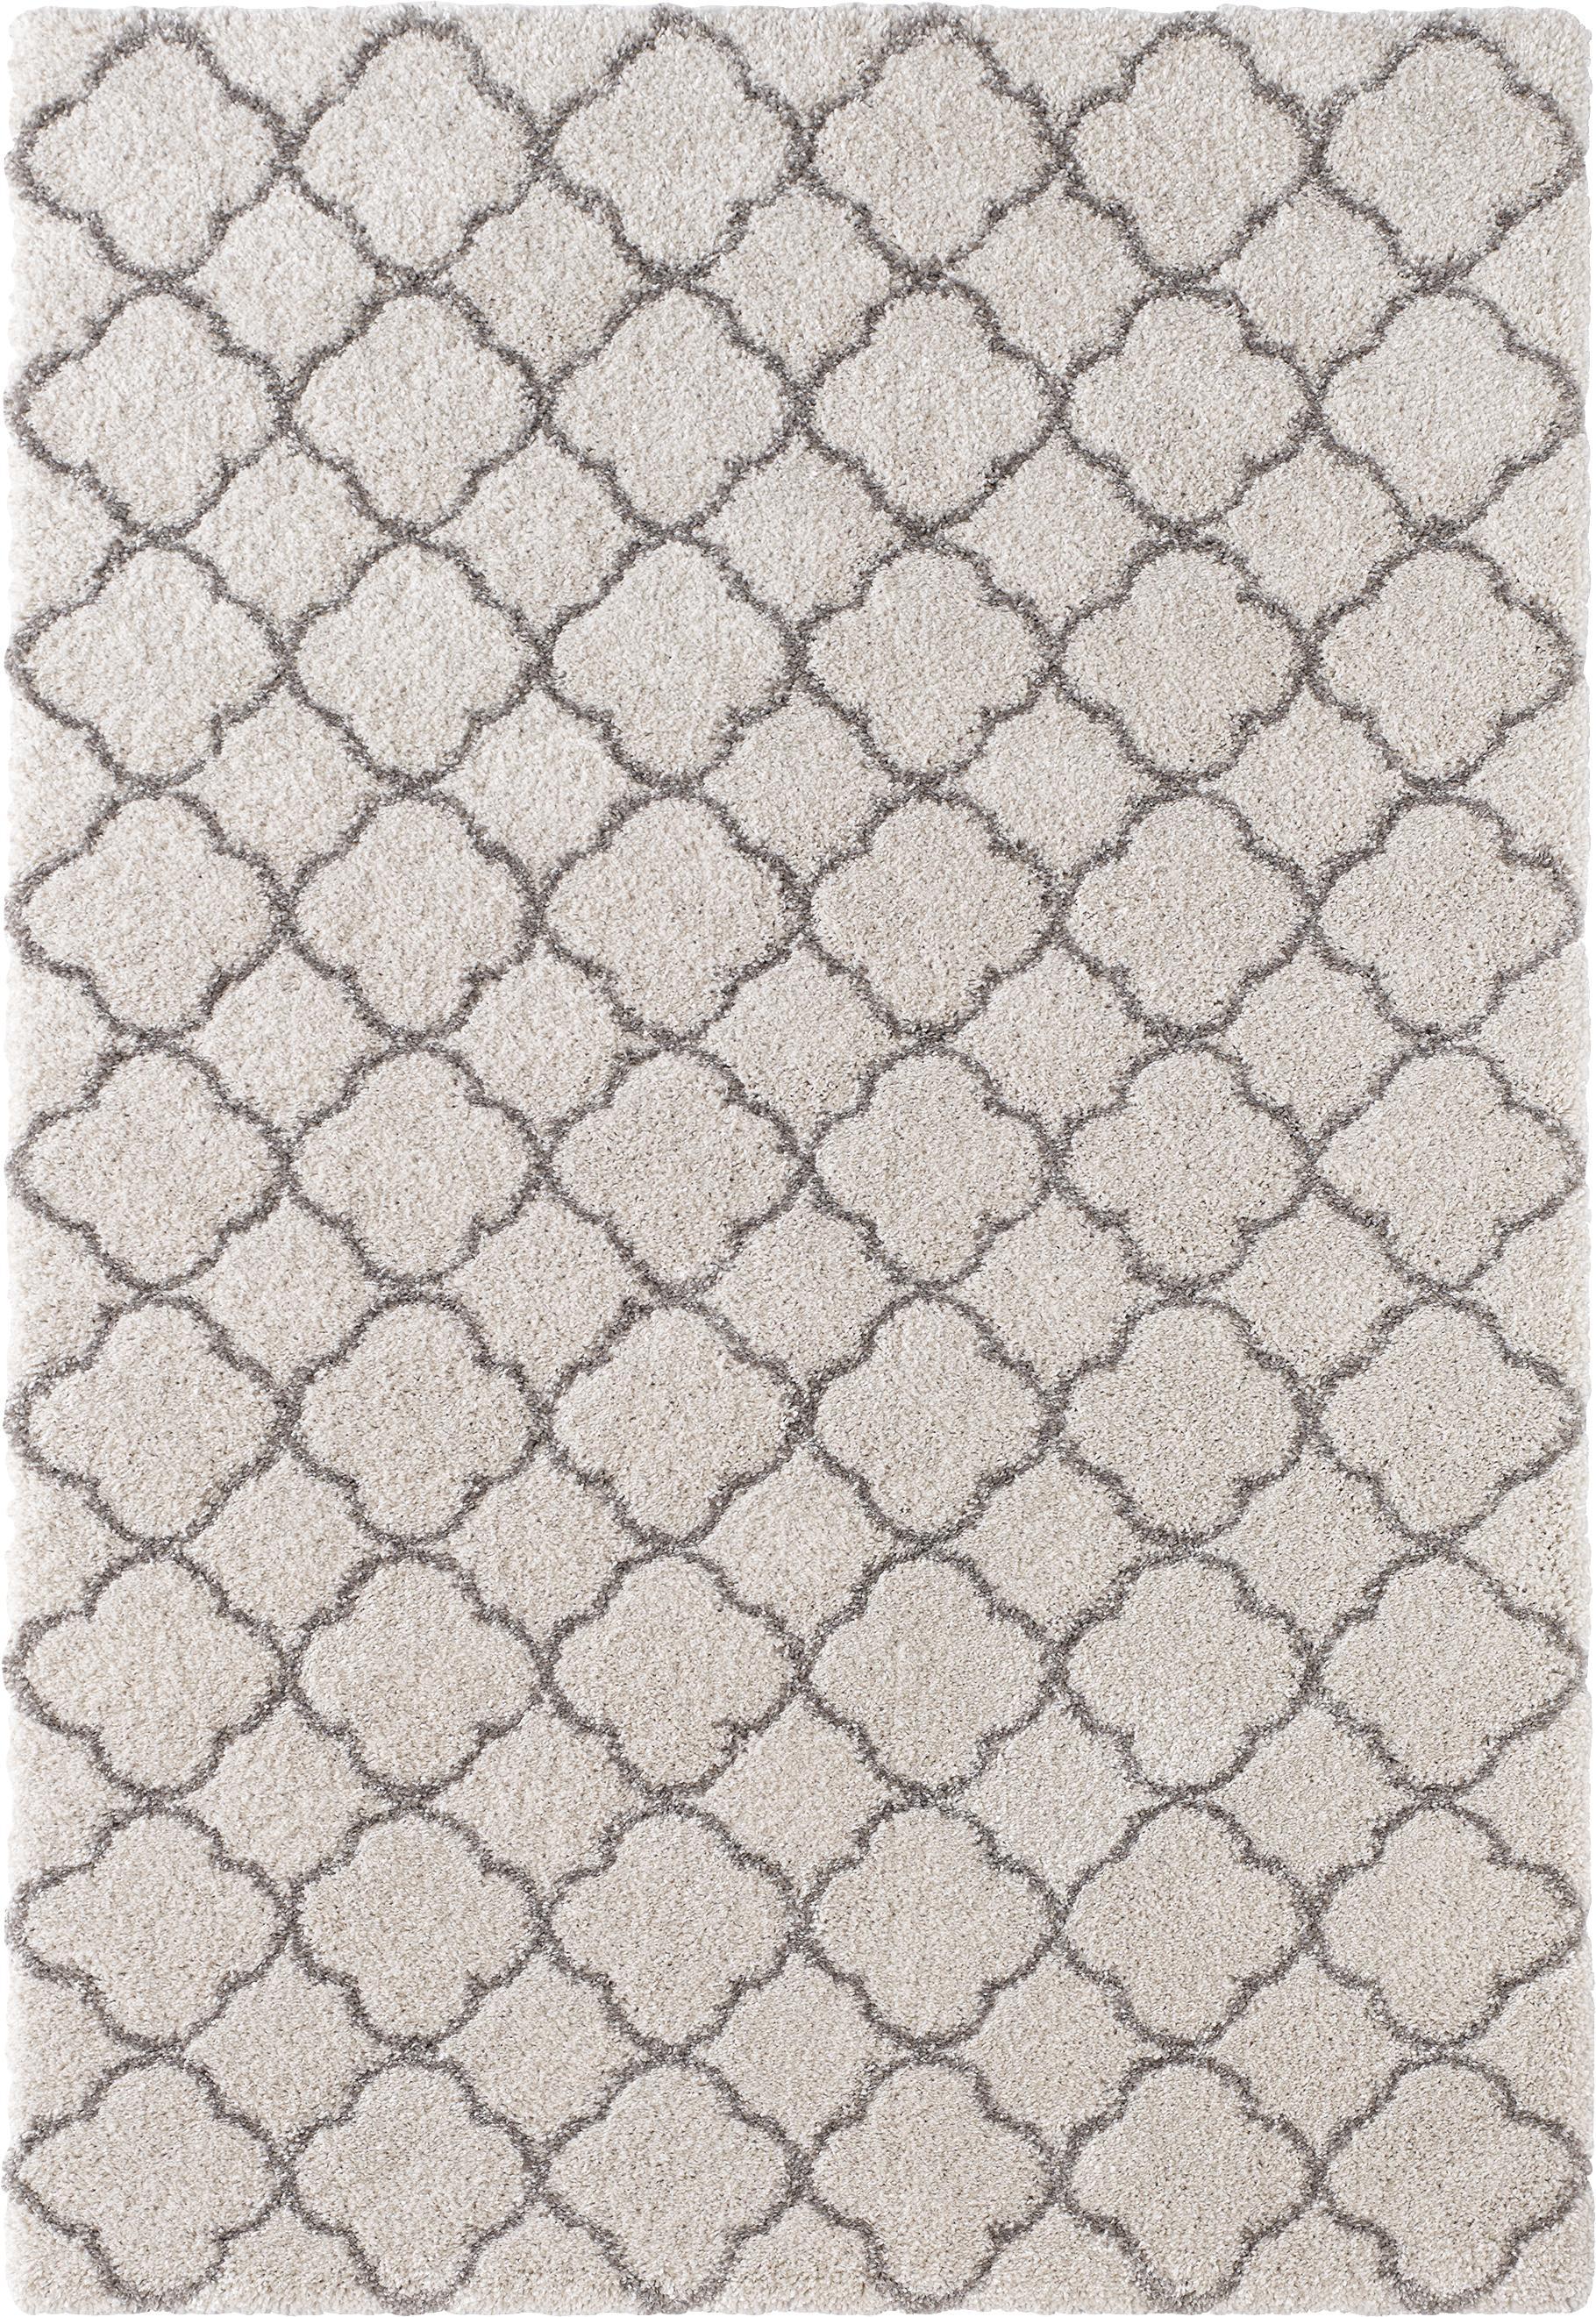 Hochflor-Teppich Grace in Creme/Grau, Flor: 100% Polypropylen, Creme, Grau, B 200 x L 290 cm (Größe L)